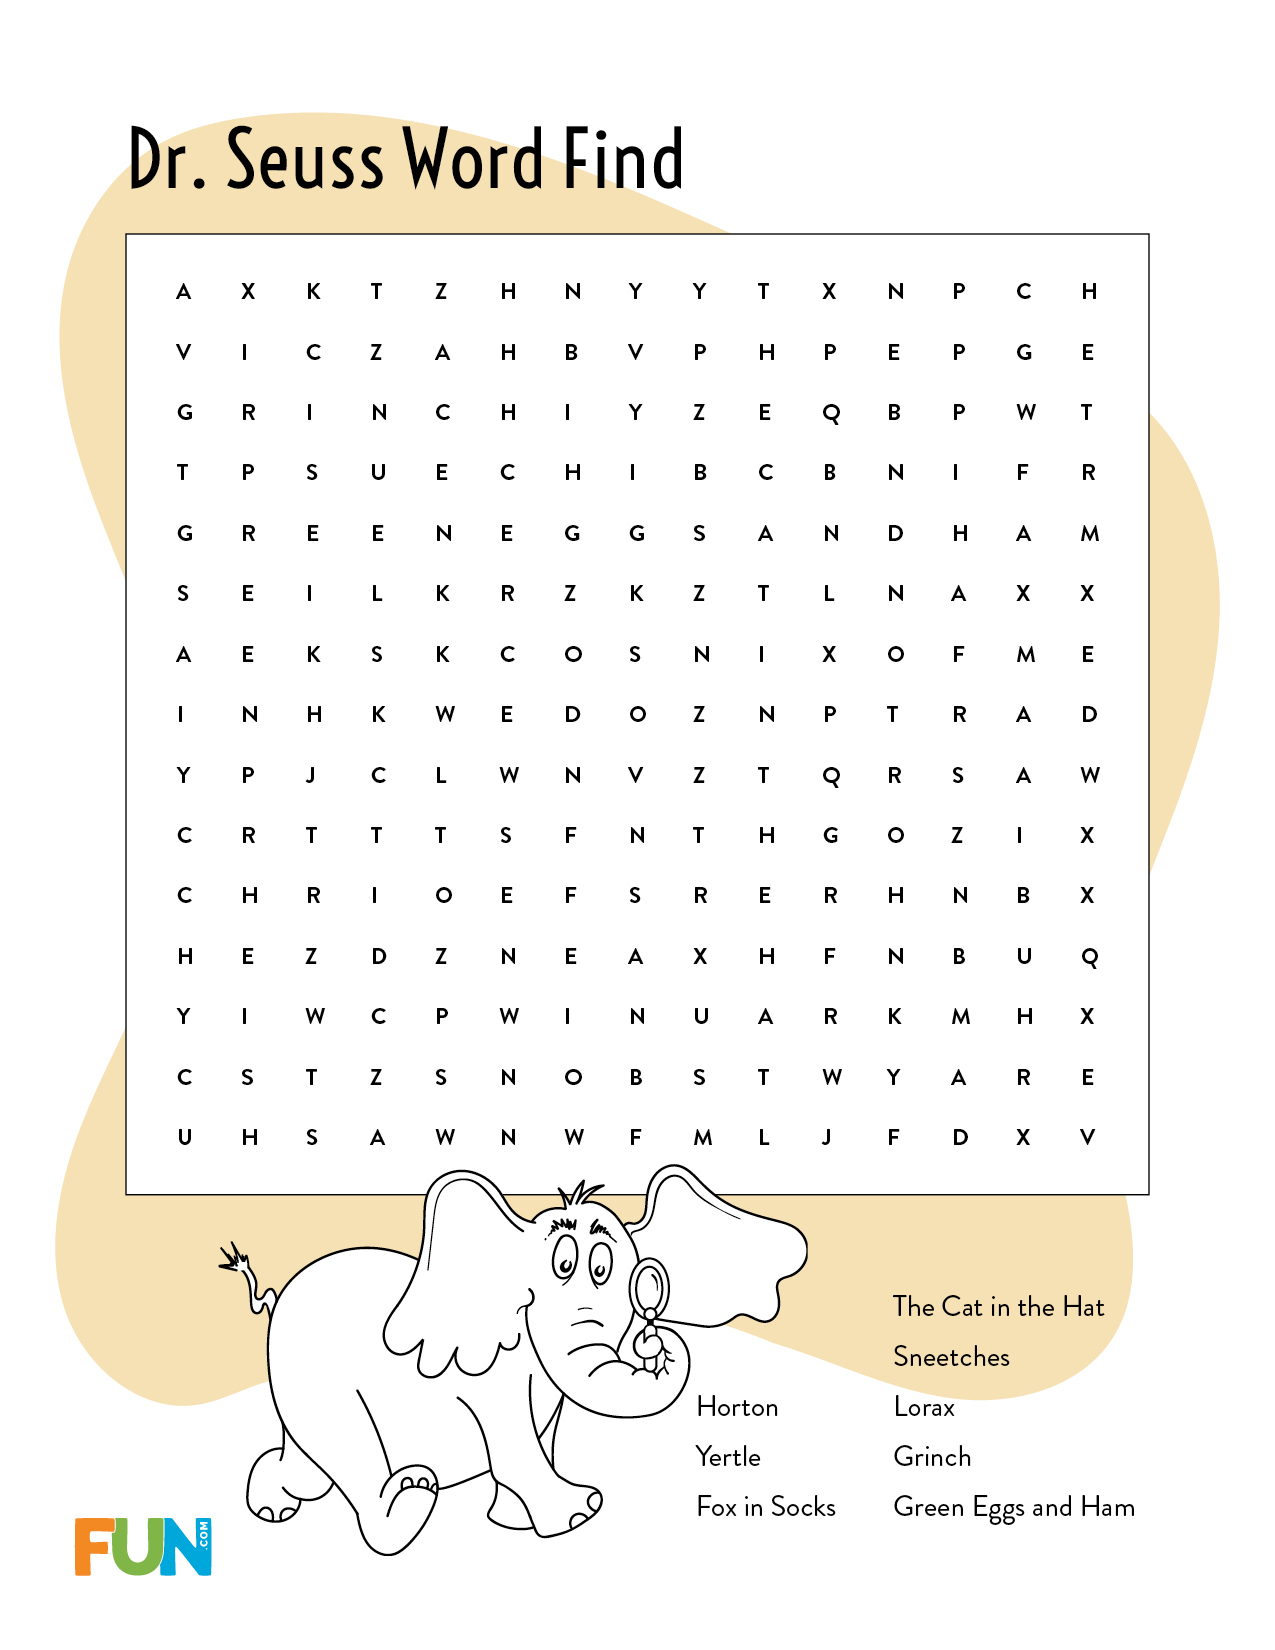 Dr. Seuss Word Find